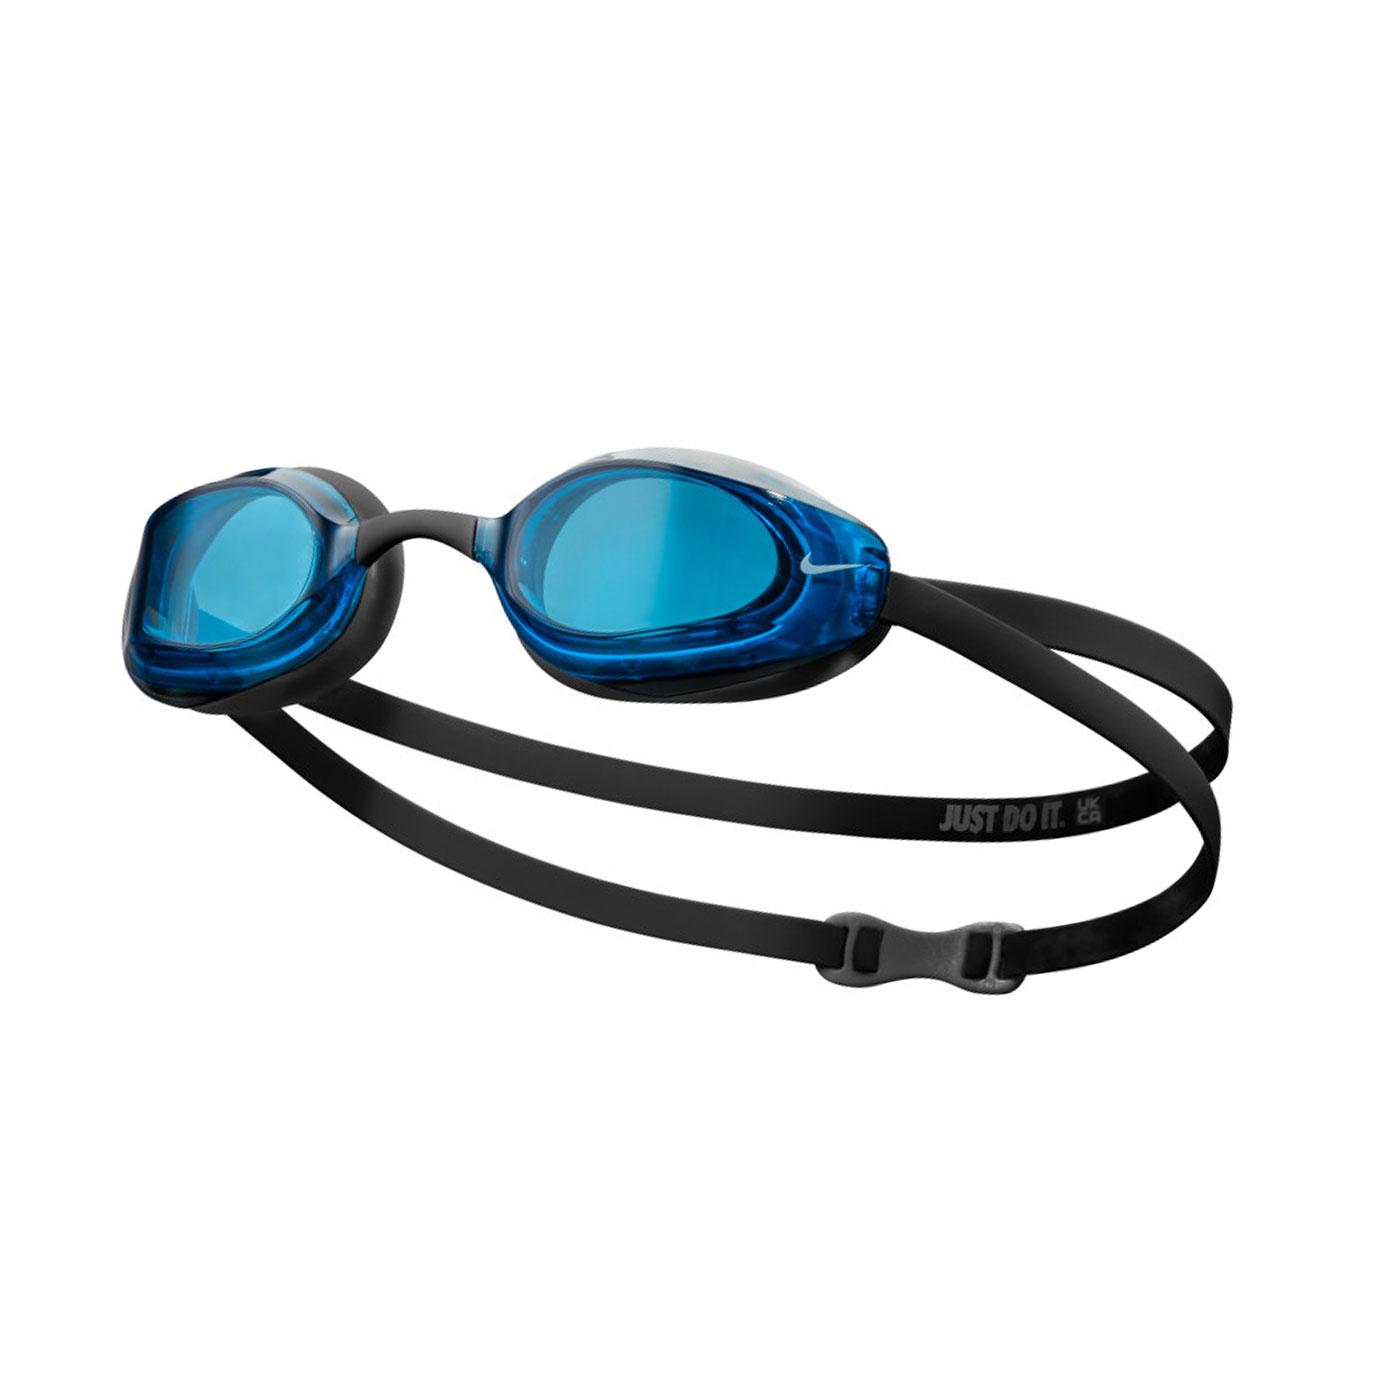 NIKE 成人專業型泳鏡 NESSA177-400